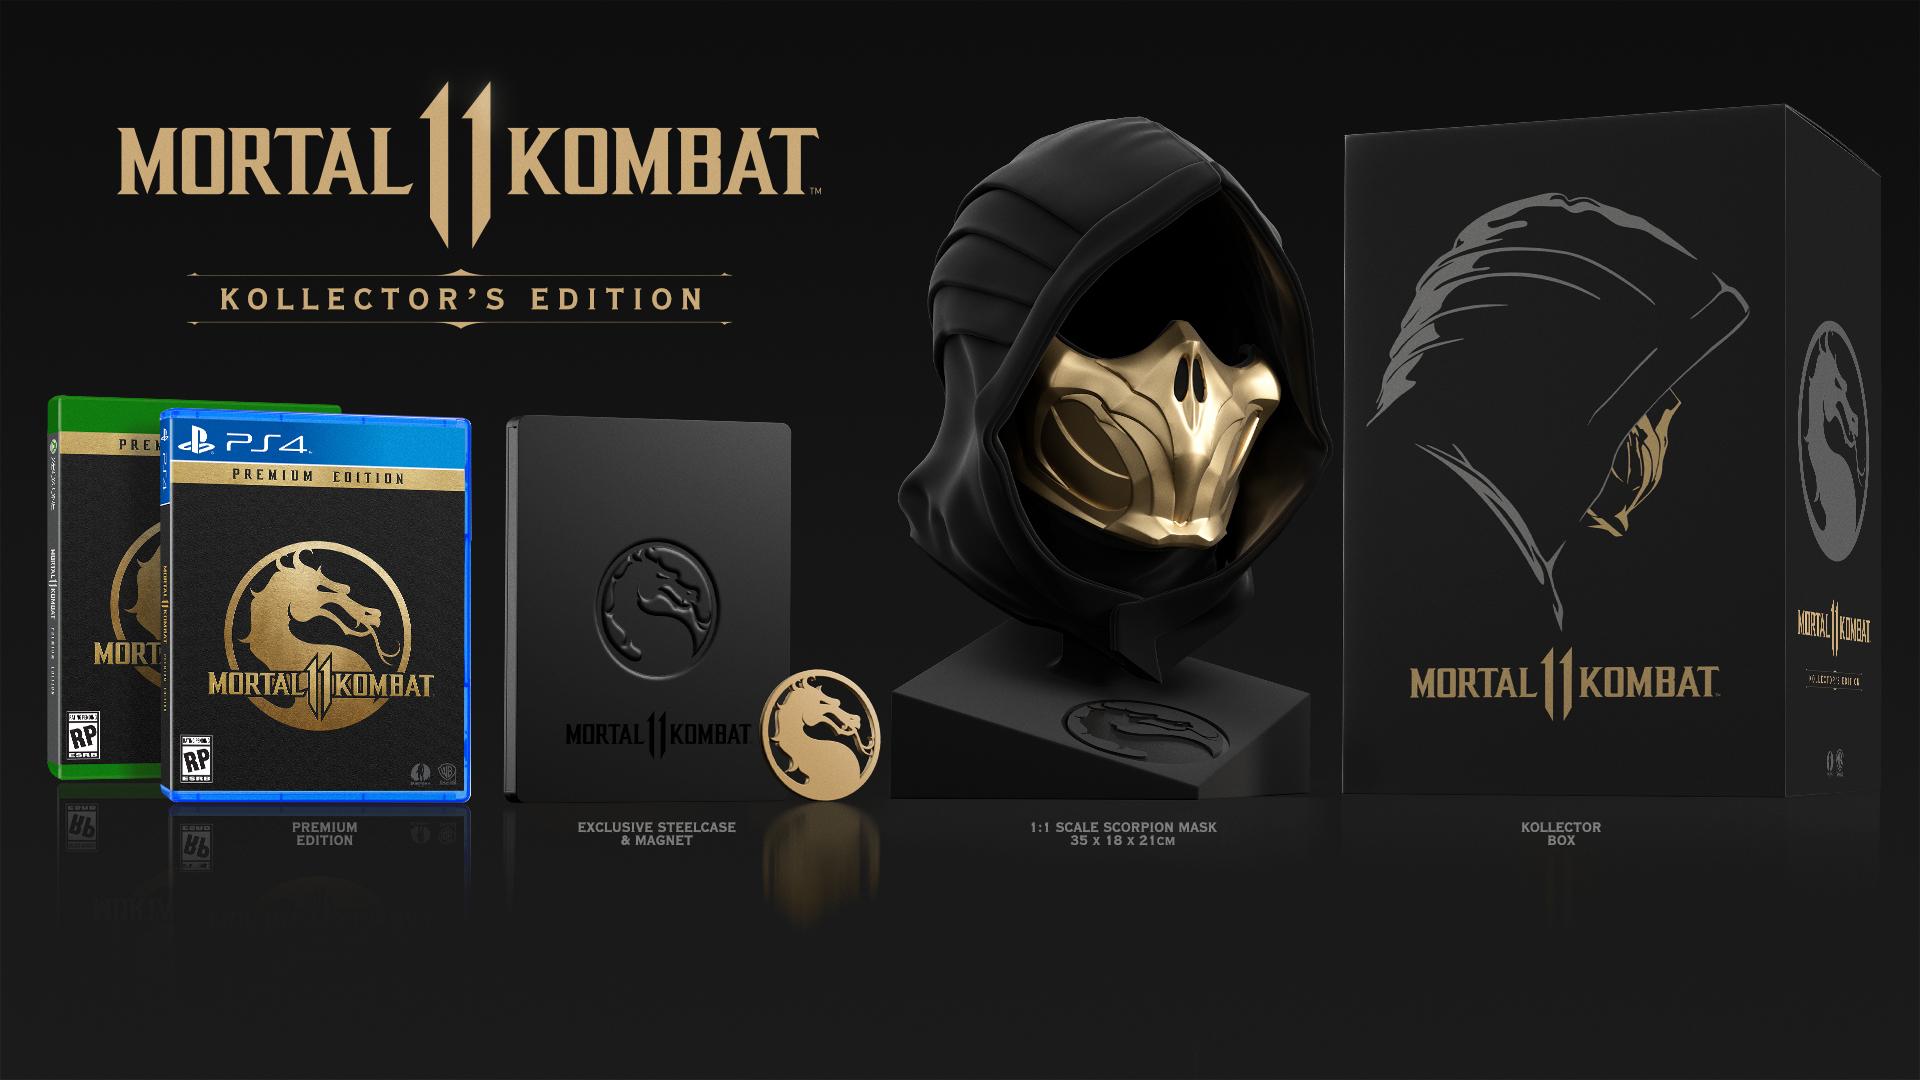 Kollector's Edition - Mortal Kombat 11